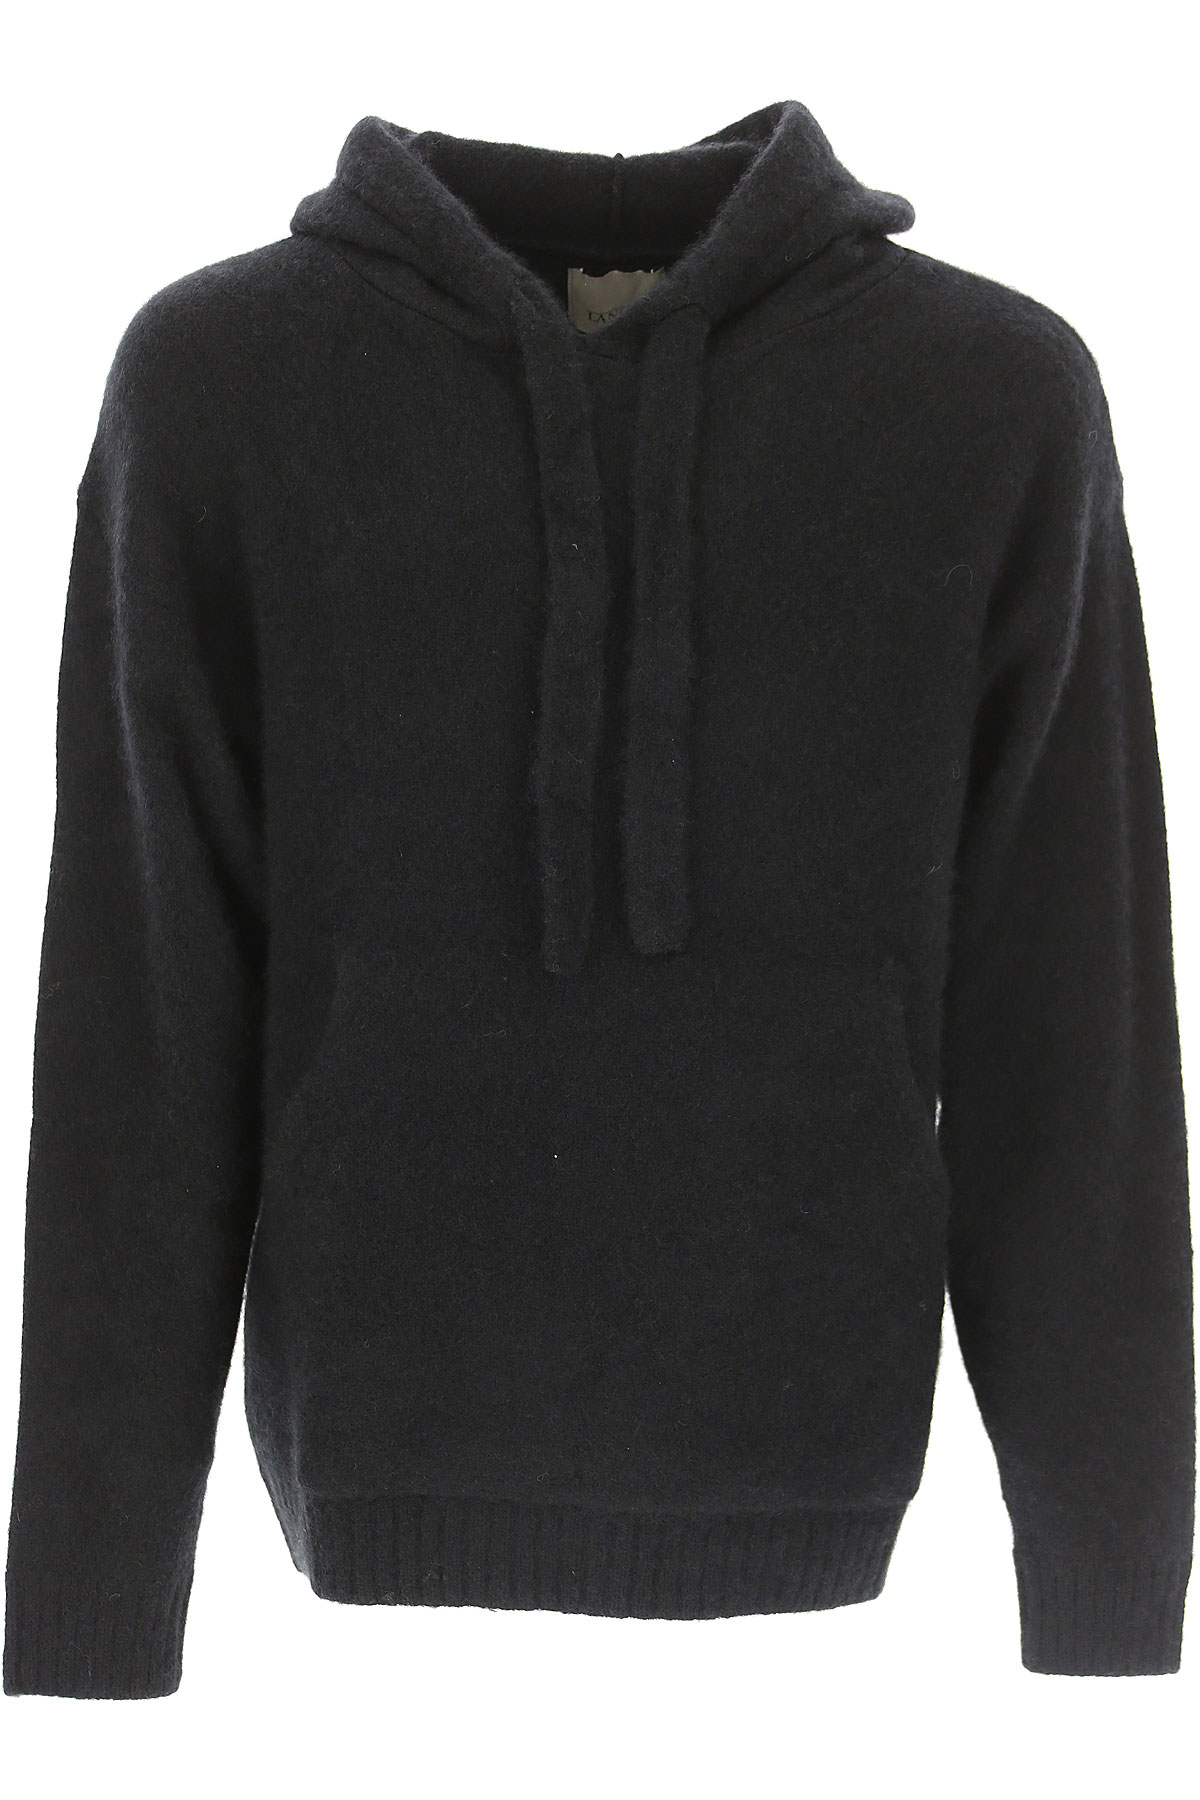 Image of Laneus Sweater for Men Jumper, Black, Cashmere, 2017, L M S XL